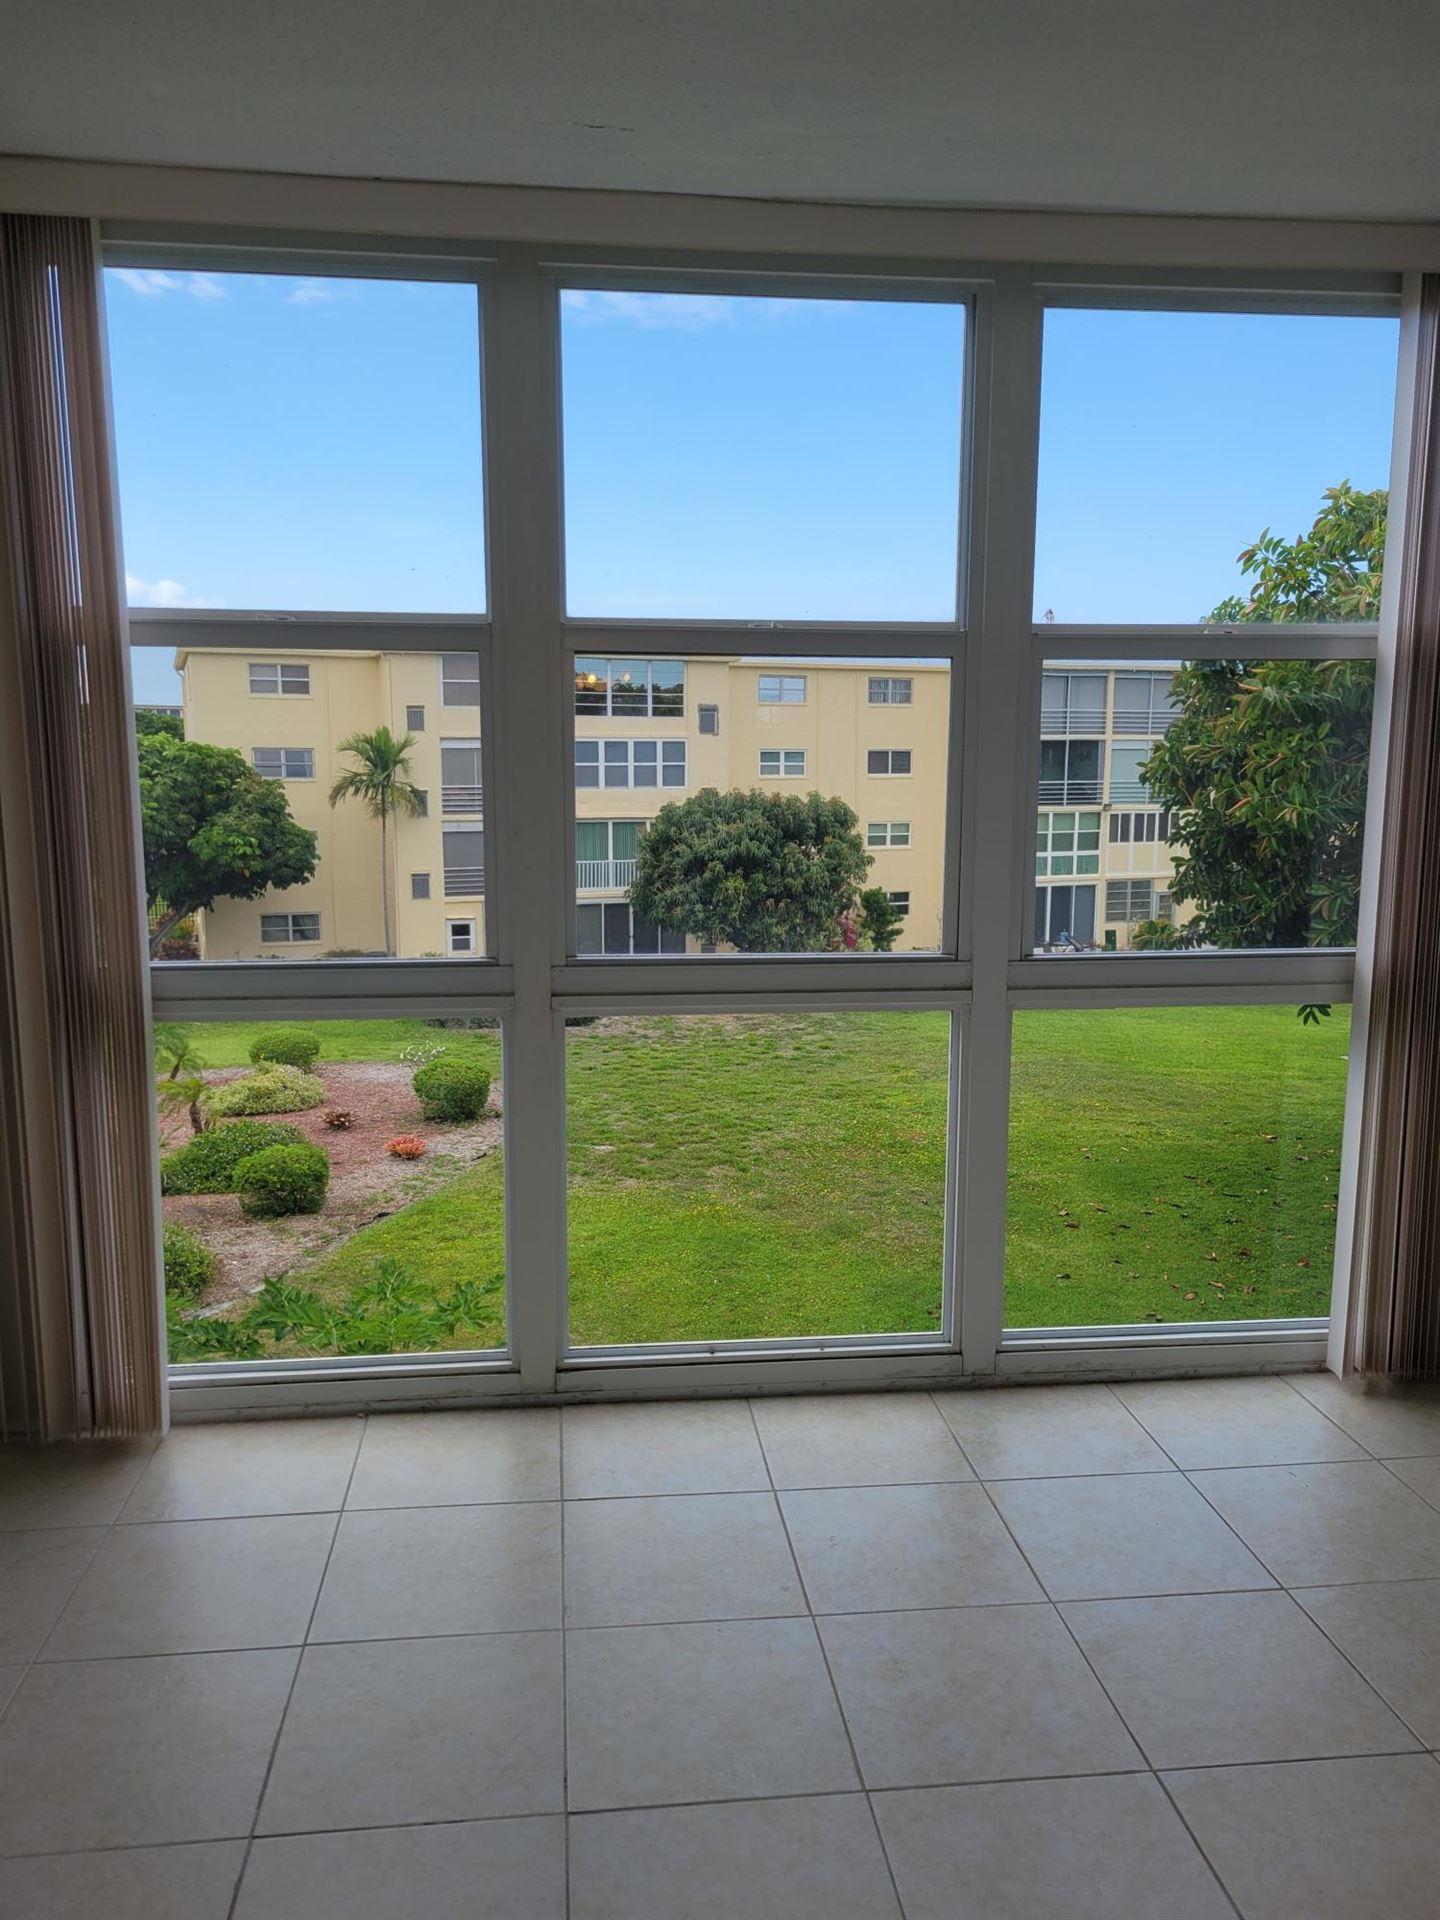 2601 NE 3rd Court #302, Boynton Beach, FL 33435 - MLS#: RX-10716240